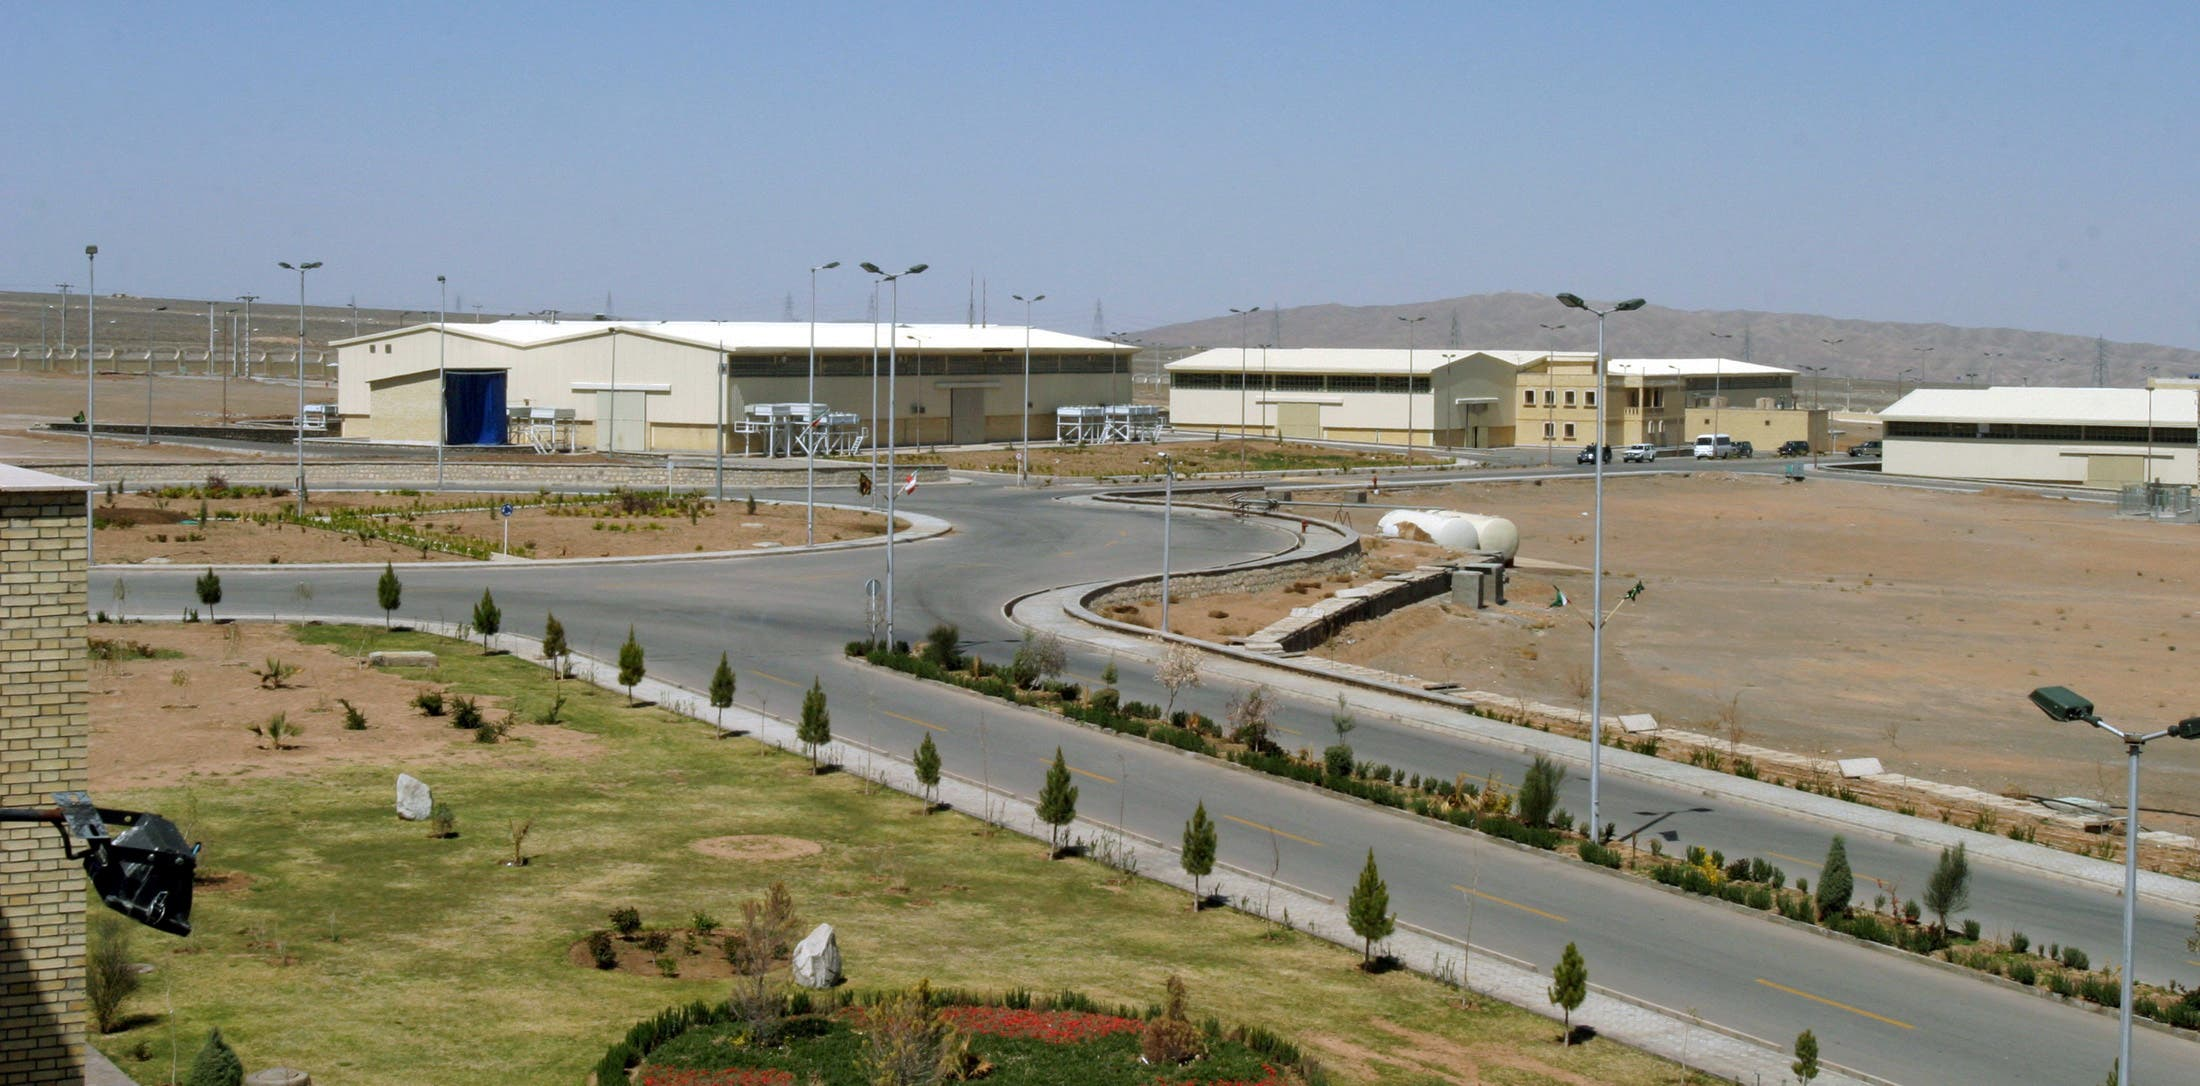 A view of the Natanz uranium enrichment facility 250 km (155 miles) south of the Iranian capital Tehran. (File photo: Reuters)